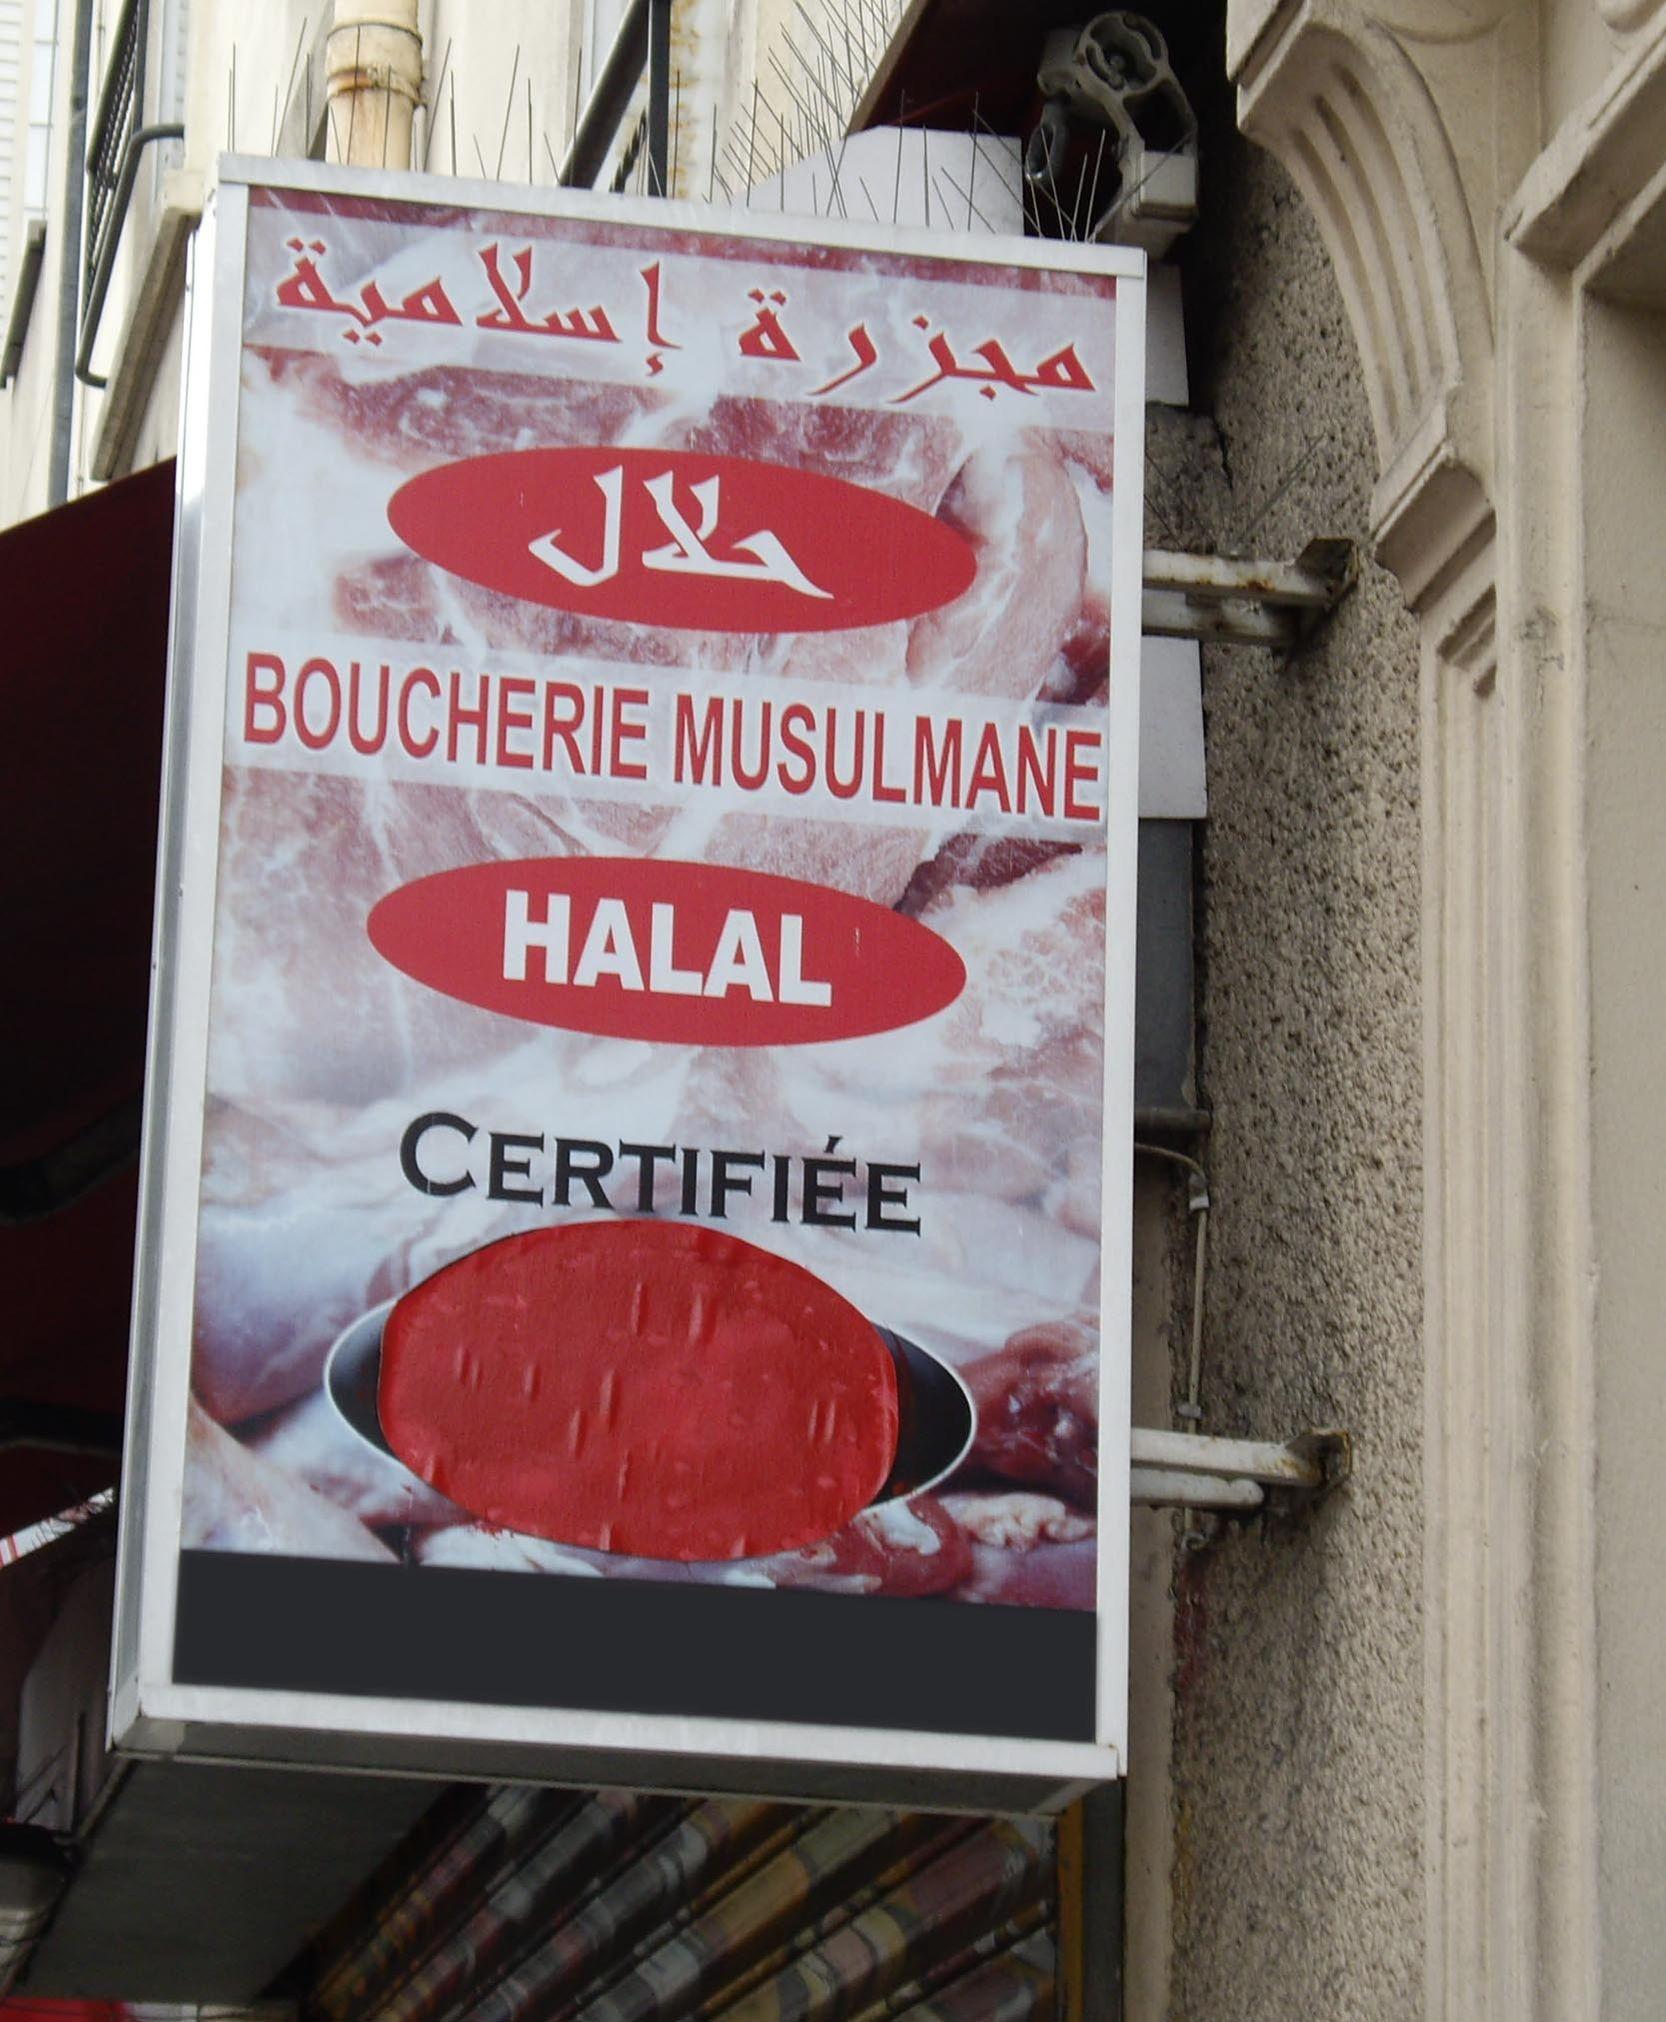 rencontre pour mariage musulman binningen